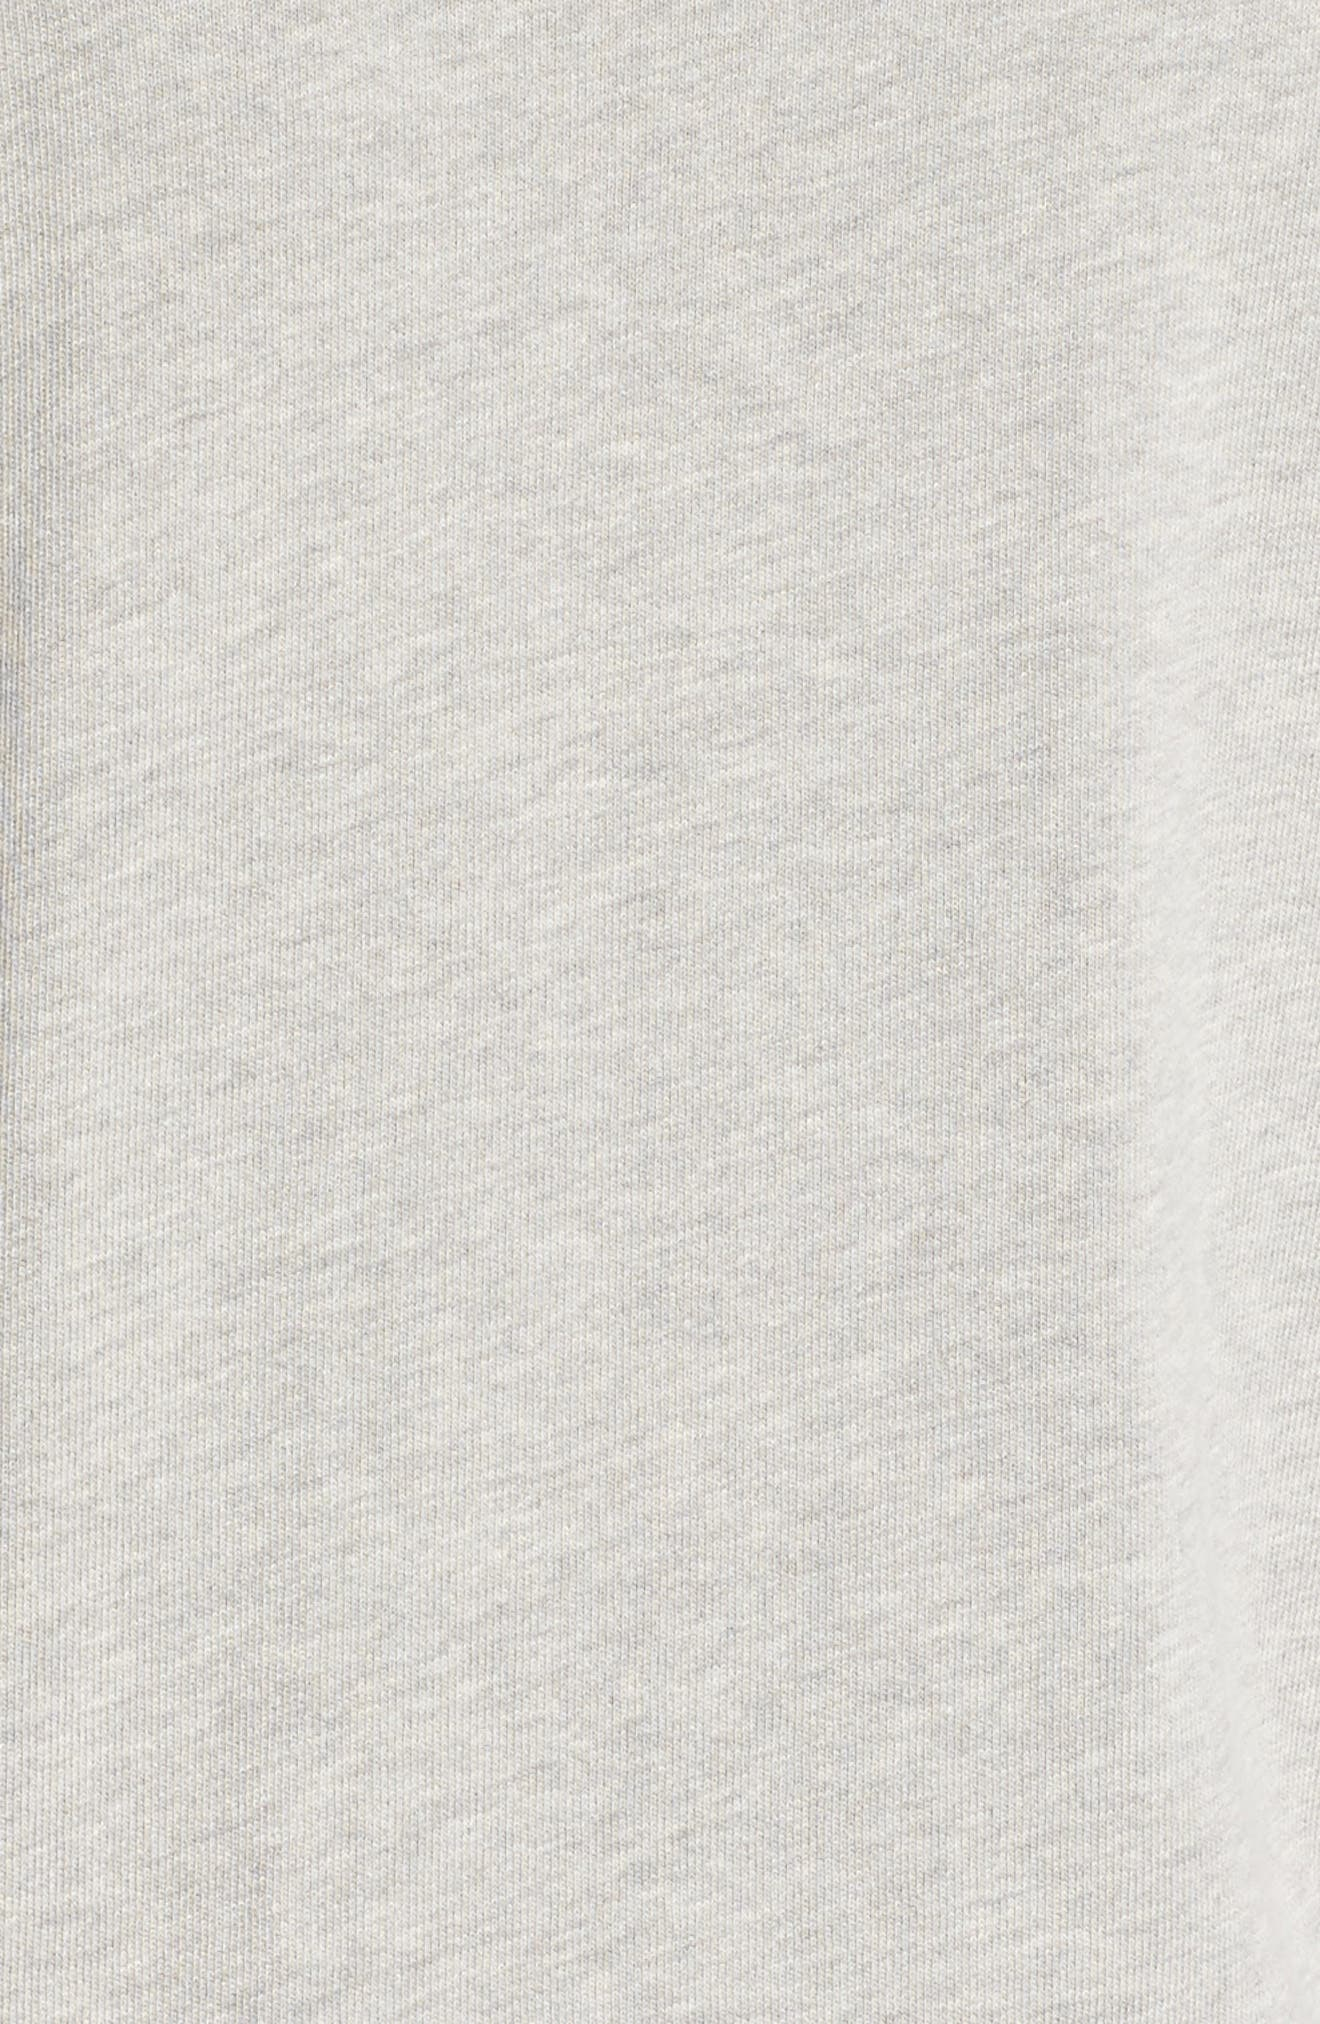 NFL Atlanta Falcons Hacci Sweatshirt,                             Alternate thumbnail 5, color,                             Dove Heather Grey